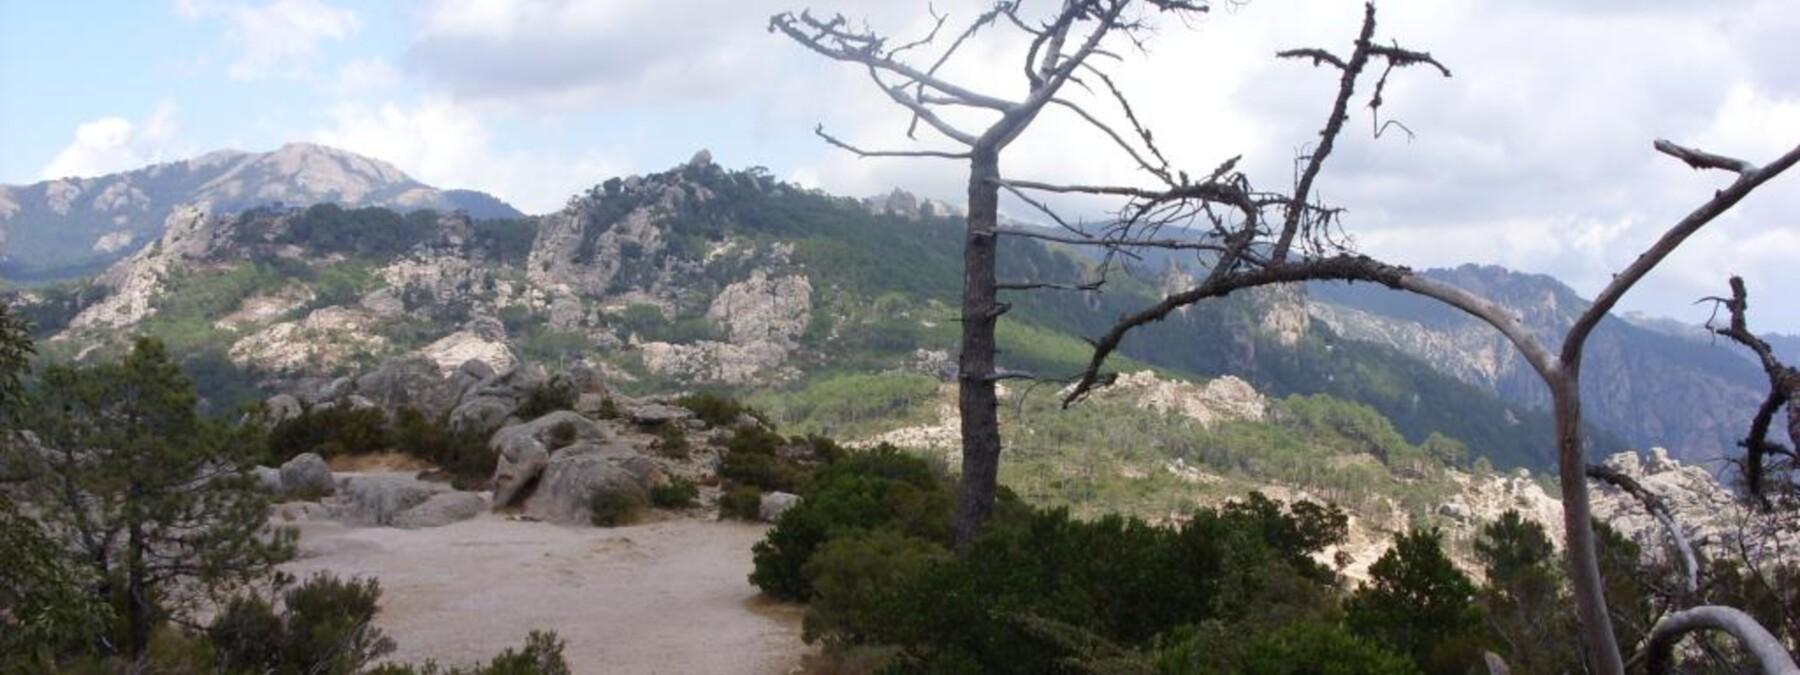 francois plateau